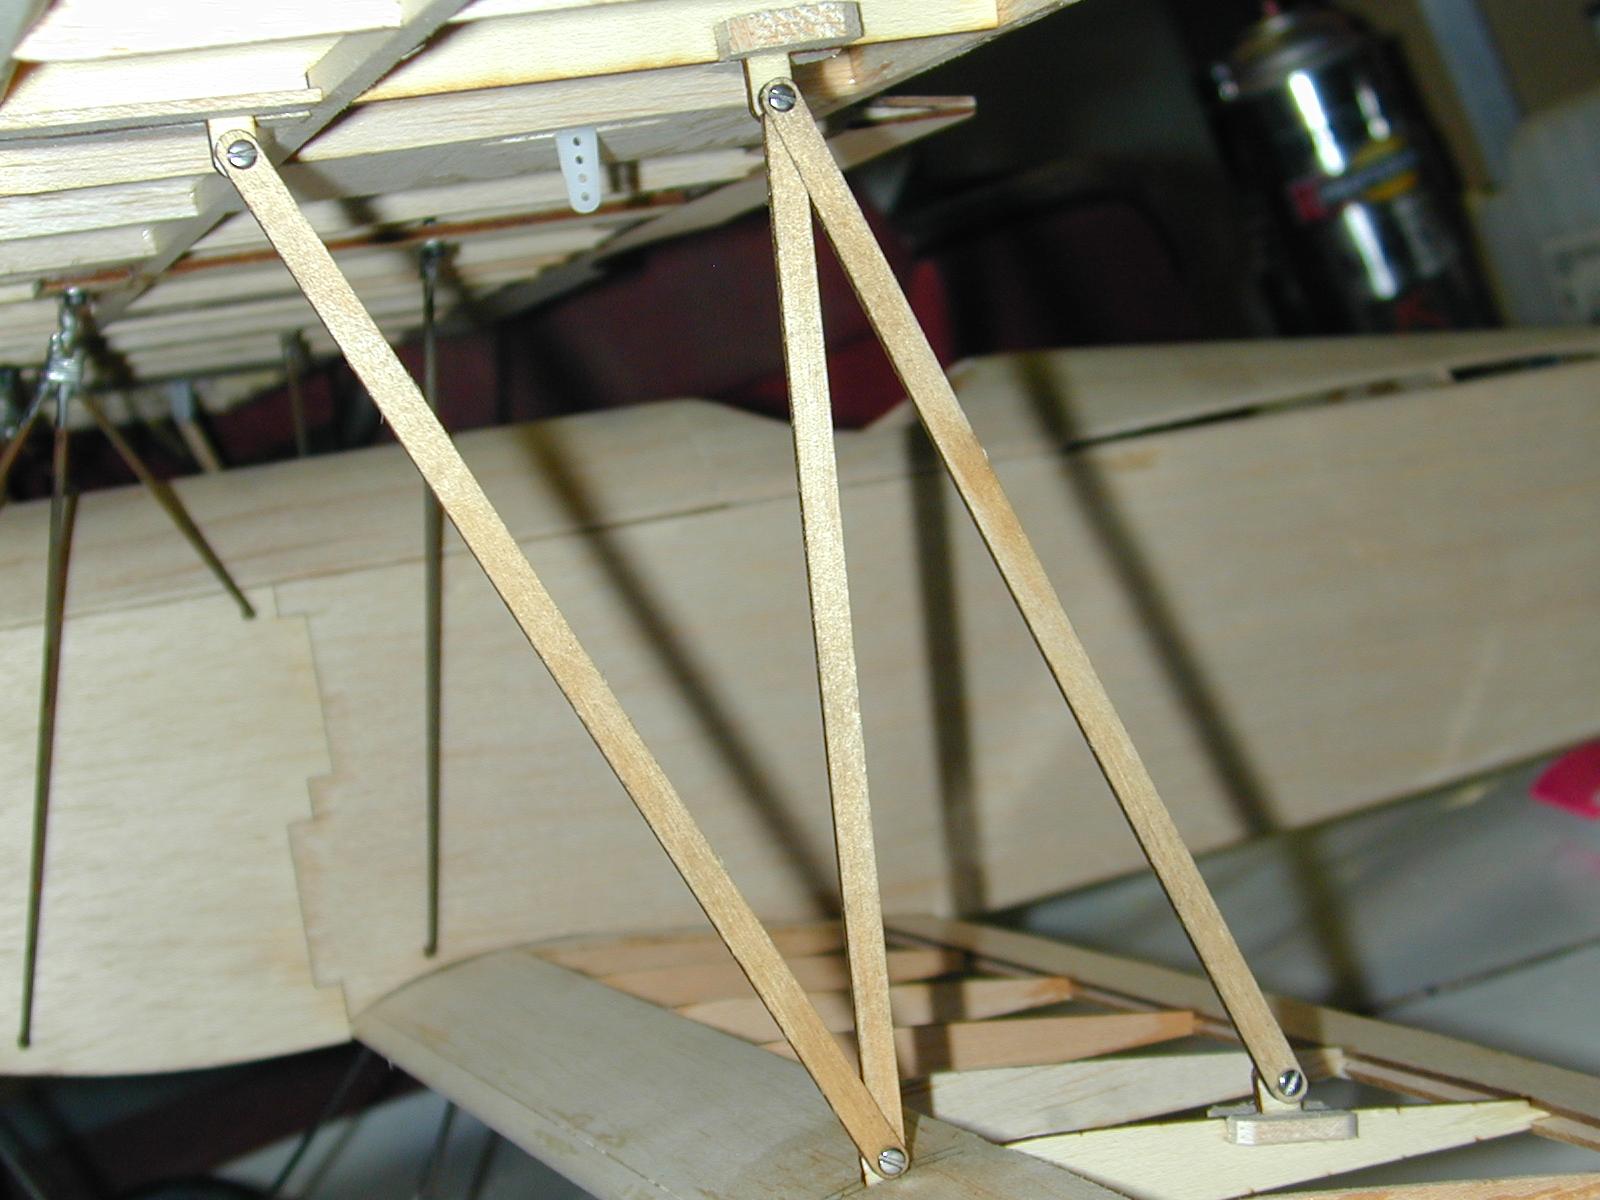 N-Strut Installation